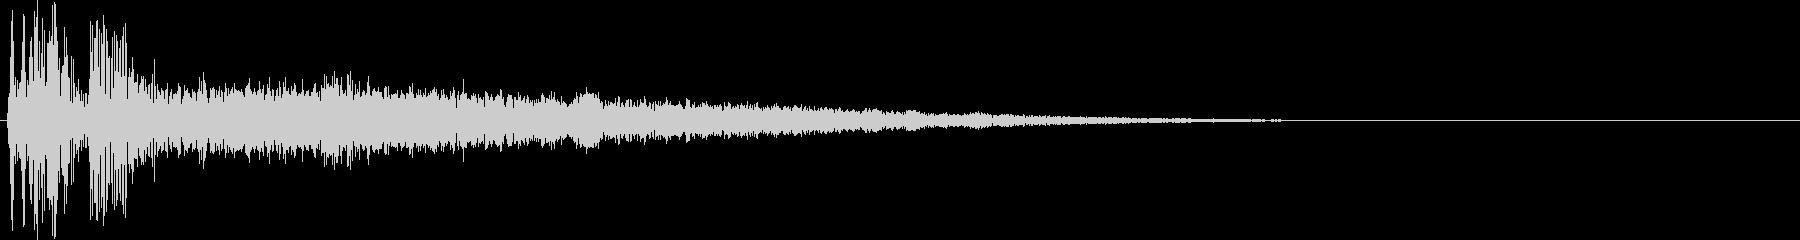 【SFX】アクション_43 ワープの未再生の波形